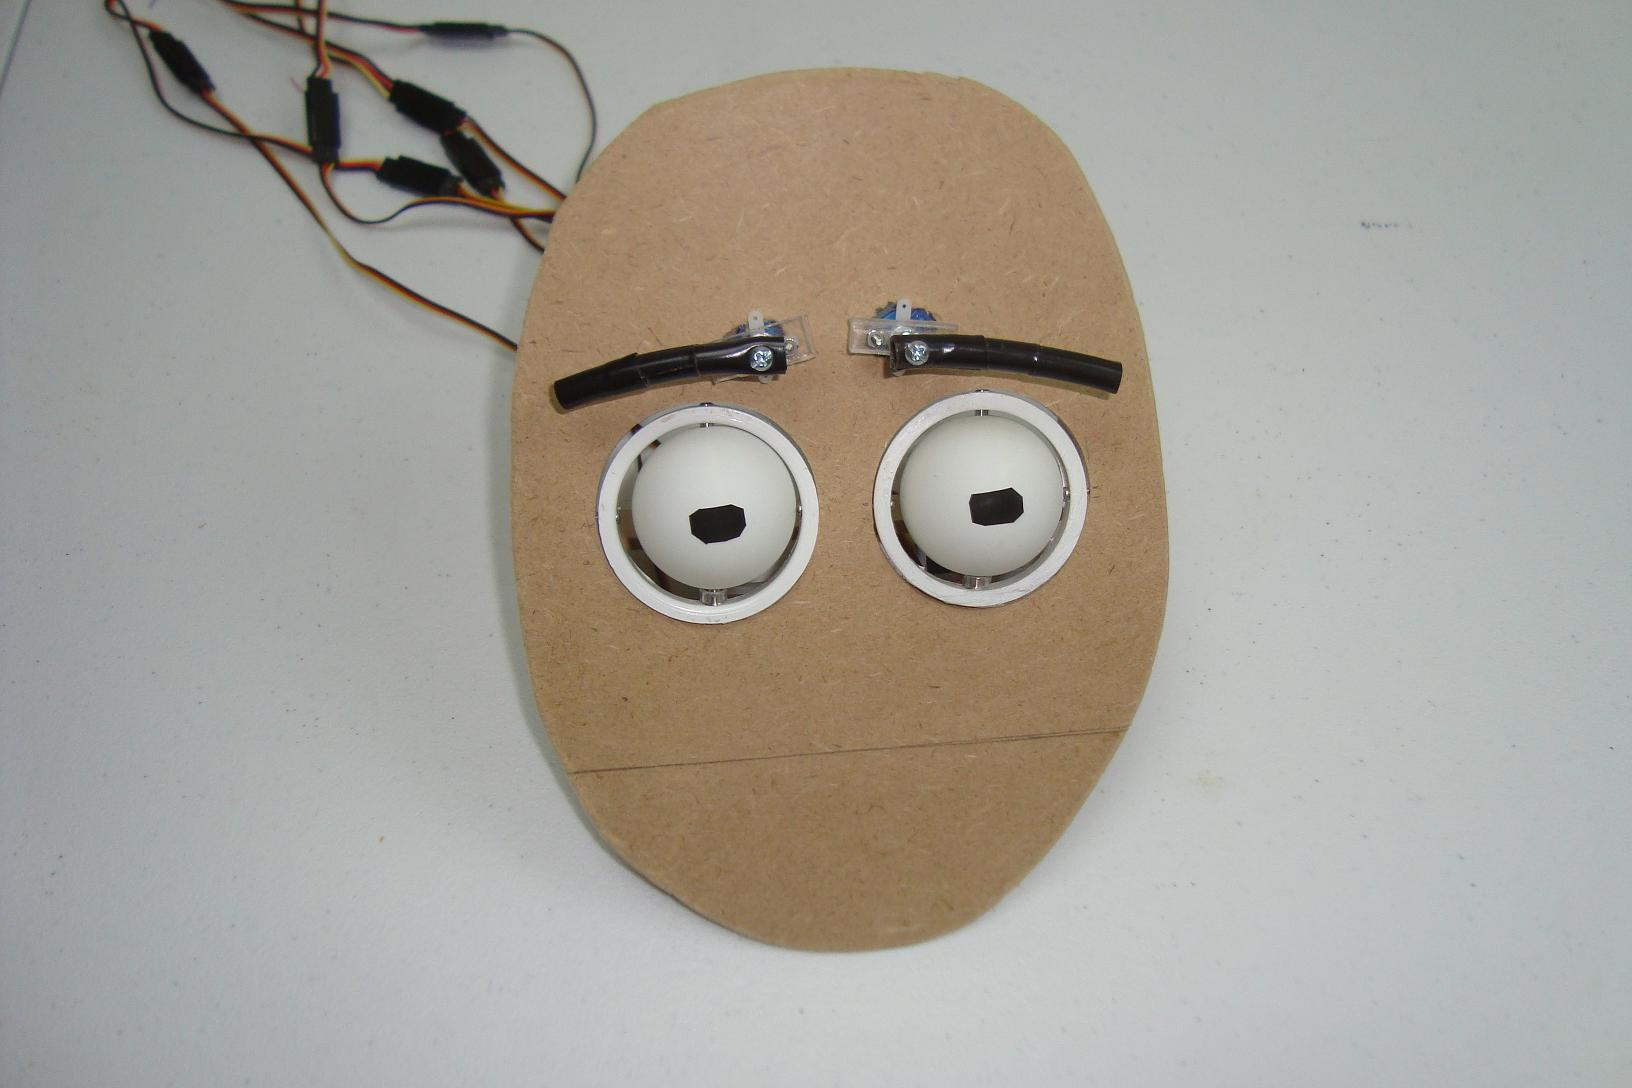 animatronic mouths servo hardware pyroelectro news projects rh pyroelectro com DIY Electronic Projects Schematics Electronics Projects